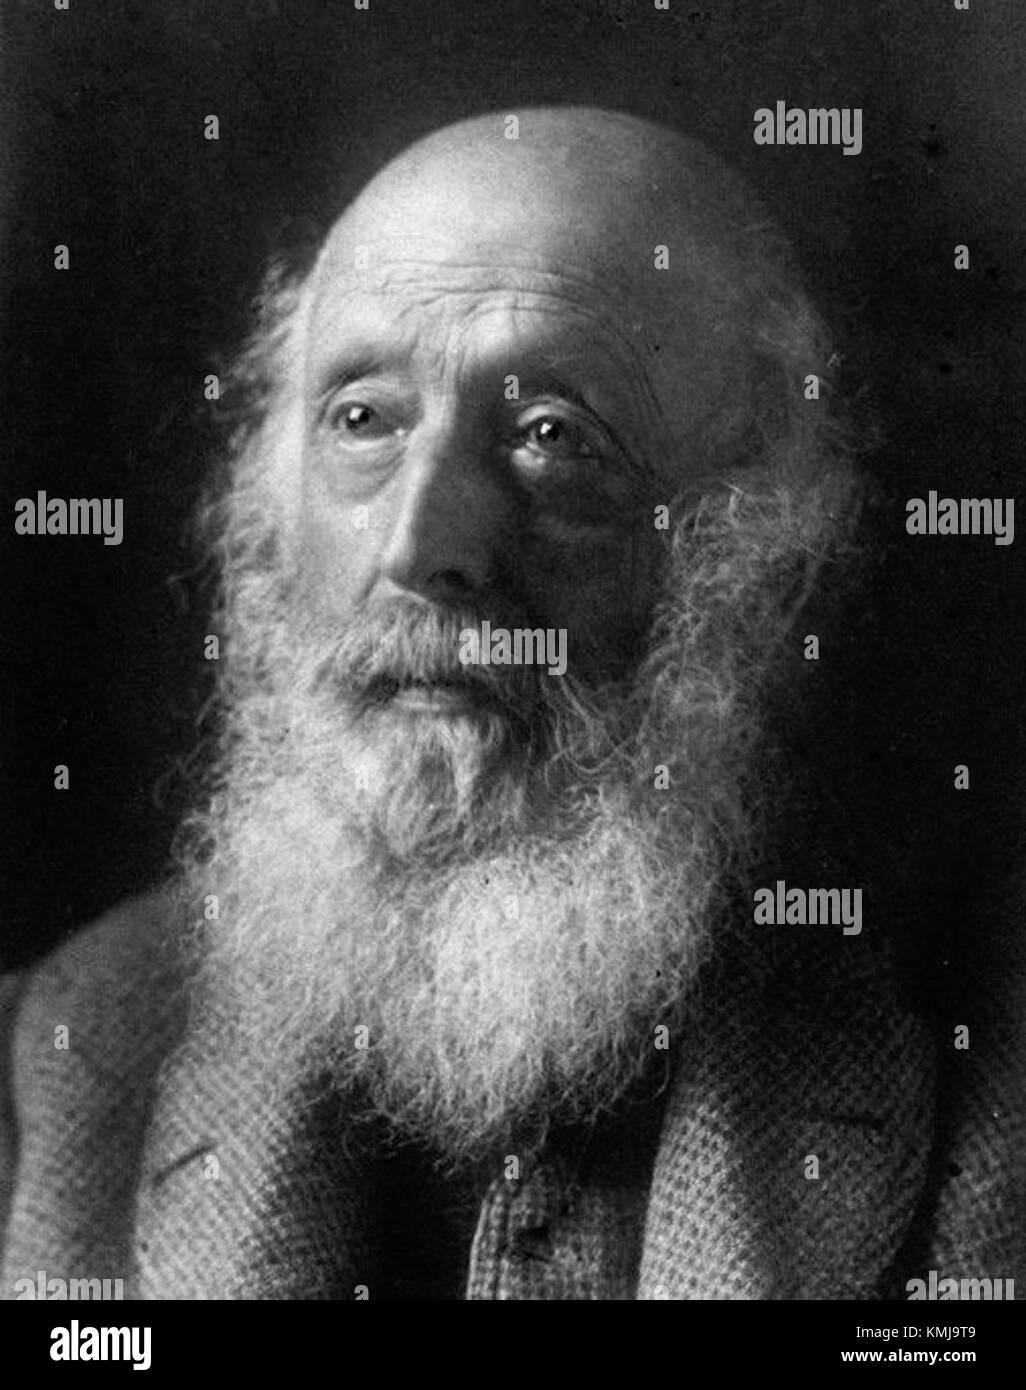 George Arthur fripp 1890 Photo Stock